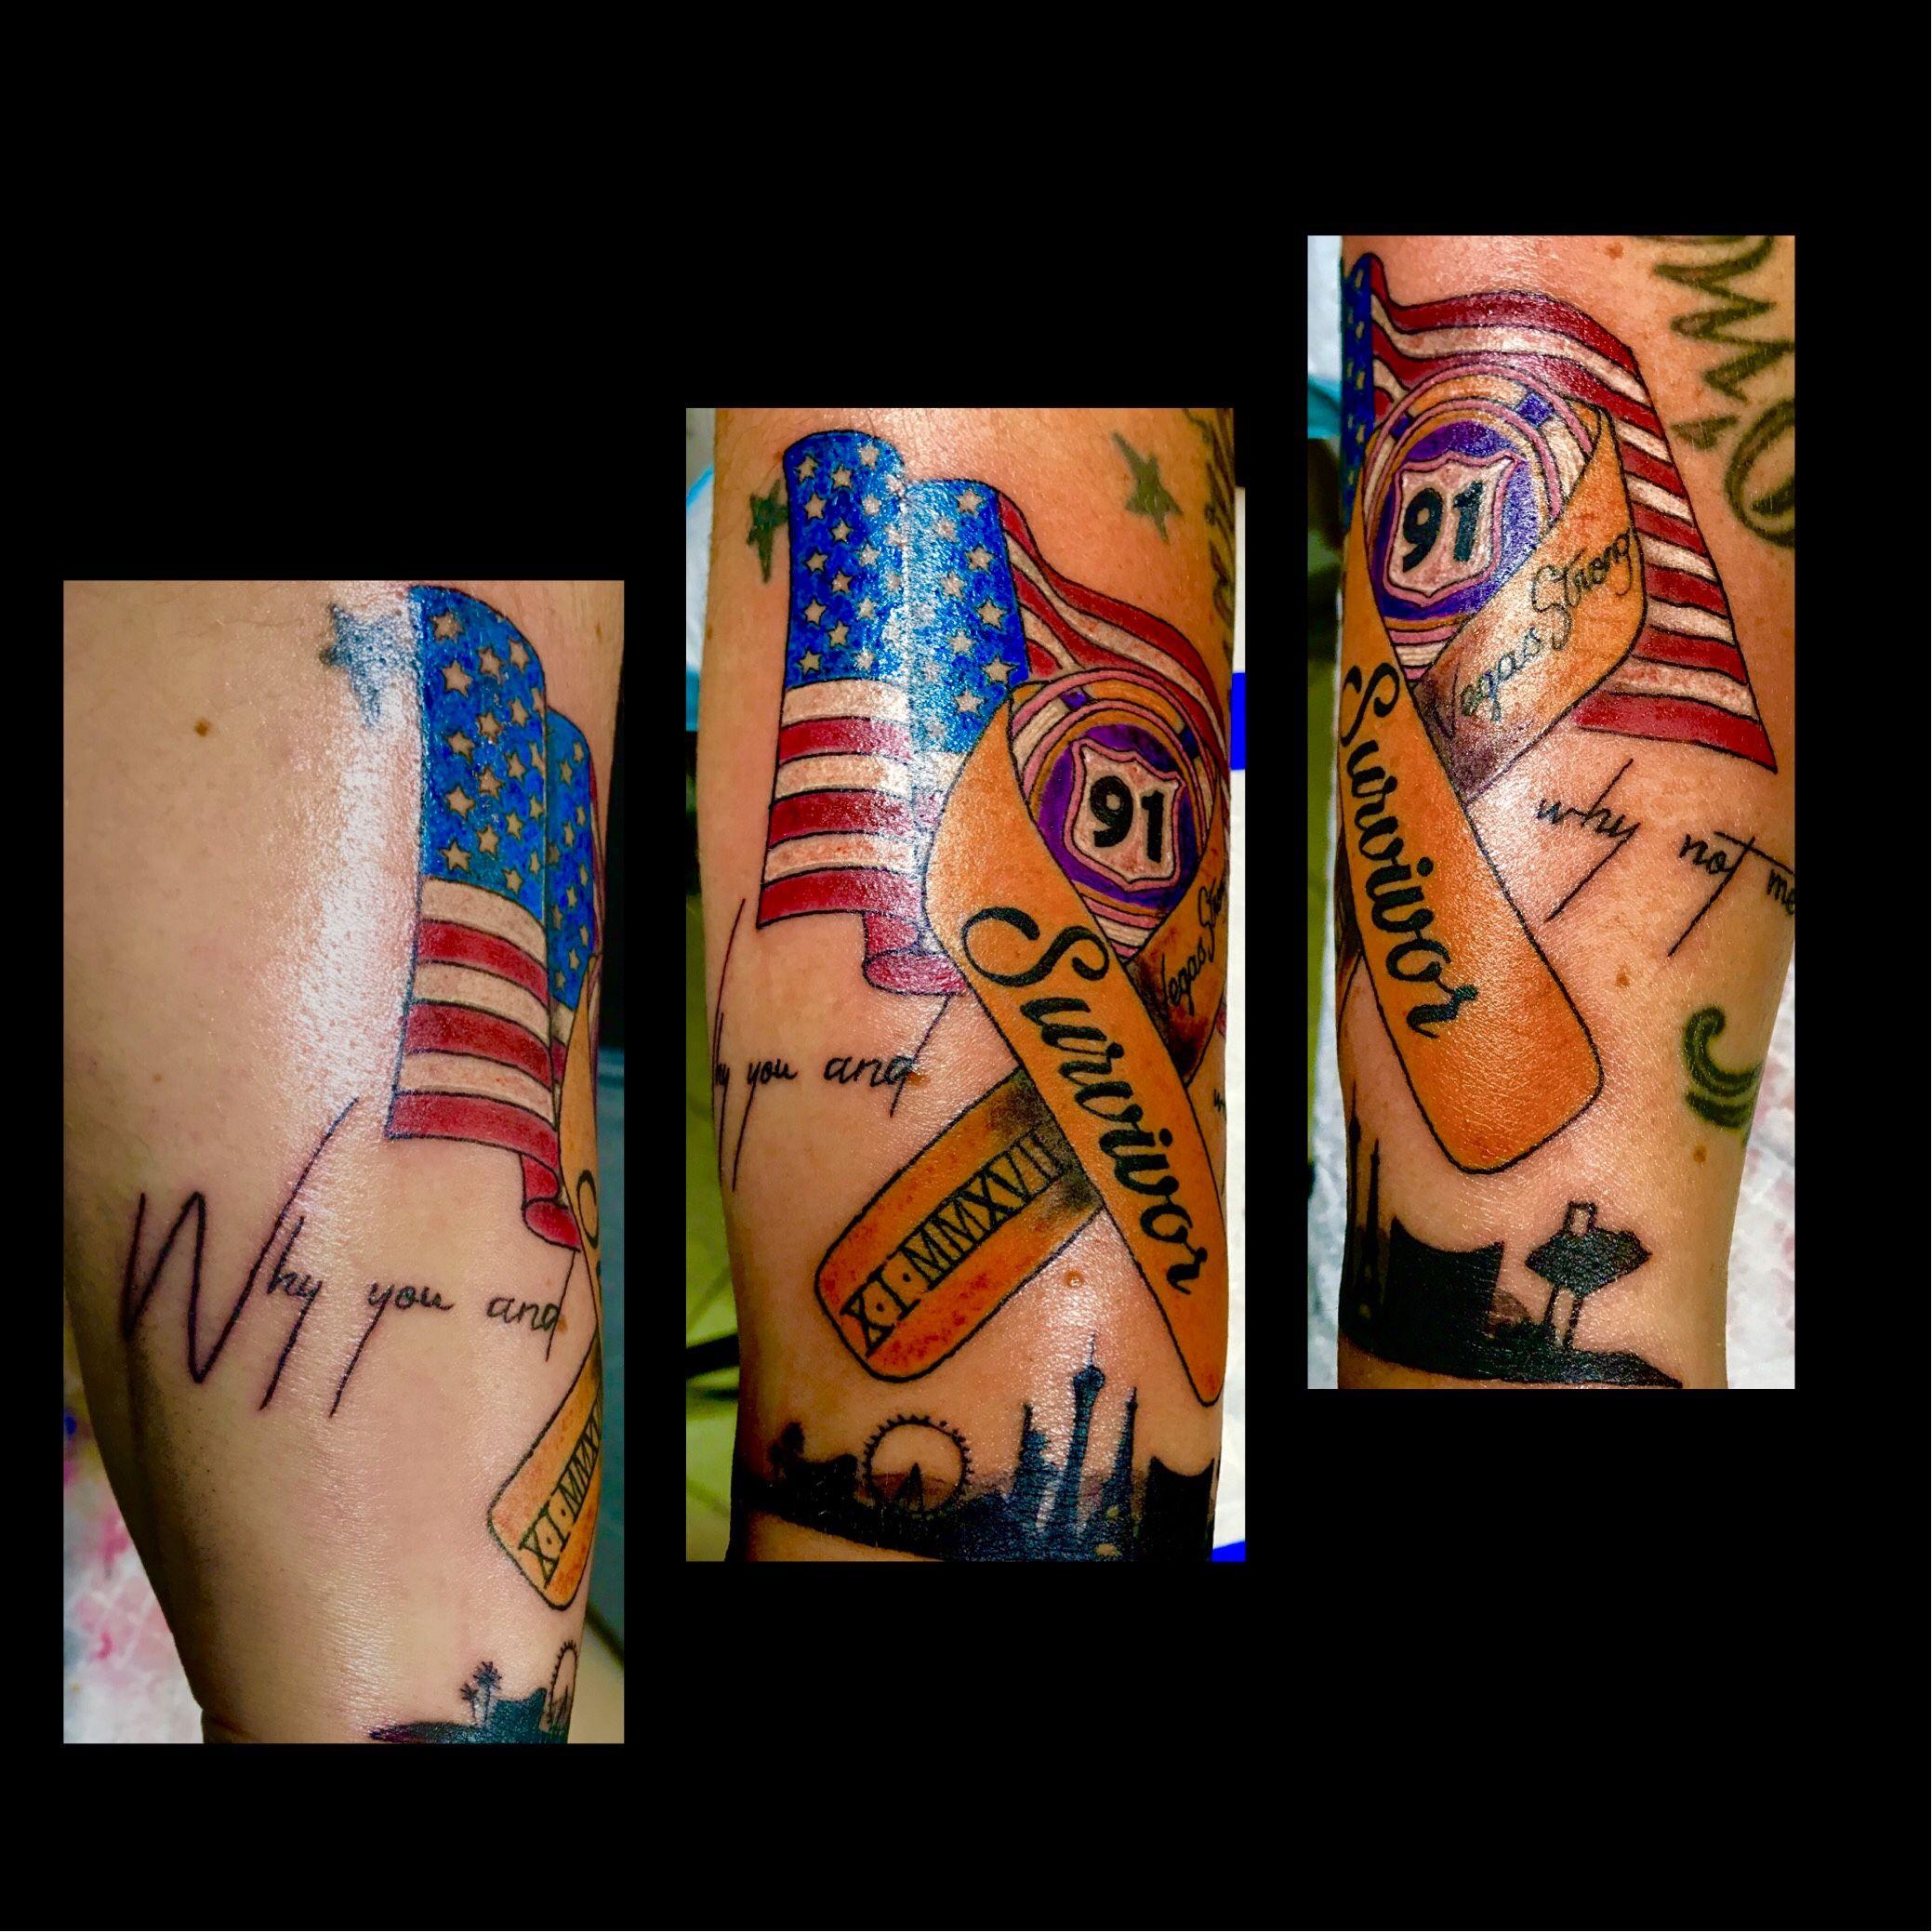 artist diego rains las vegas nm dmc tattoo route 91 pinterest tattoo. Black Bedroom Furniture Sets. Home Design Ideas